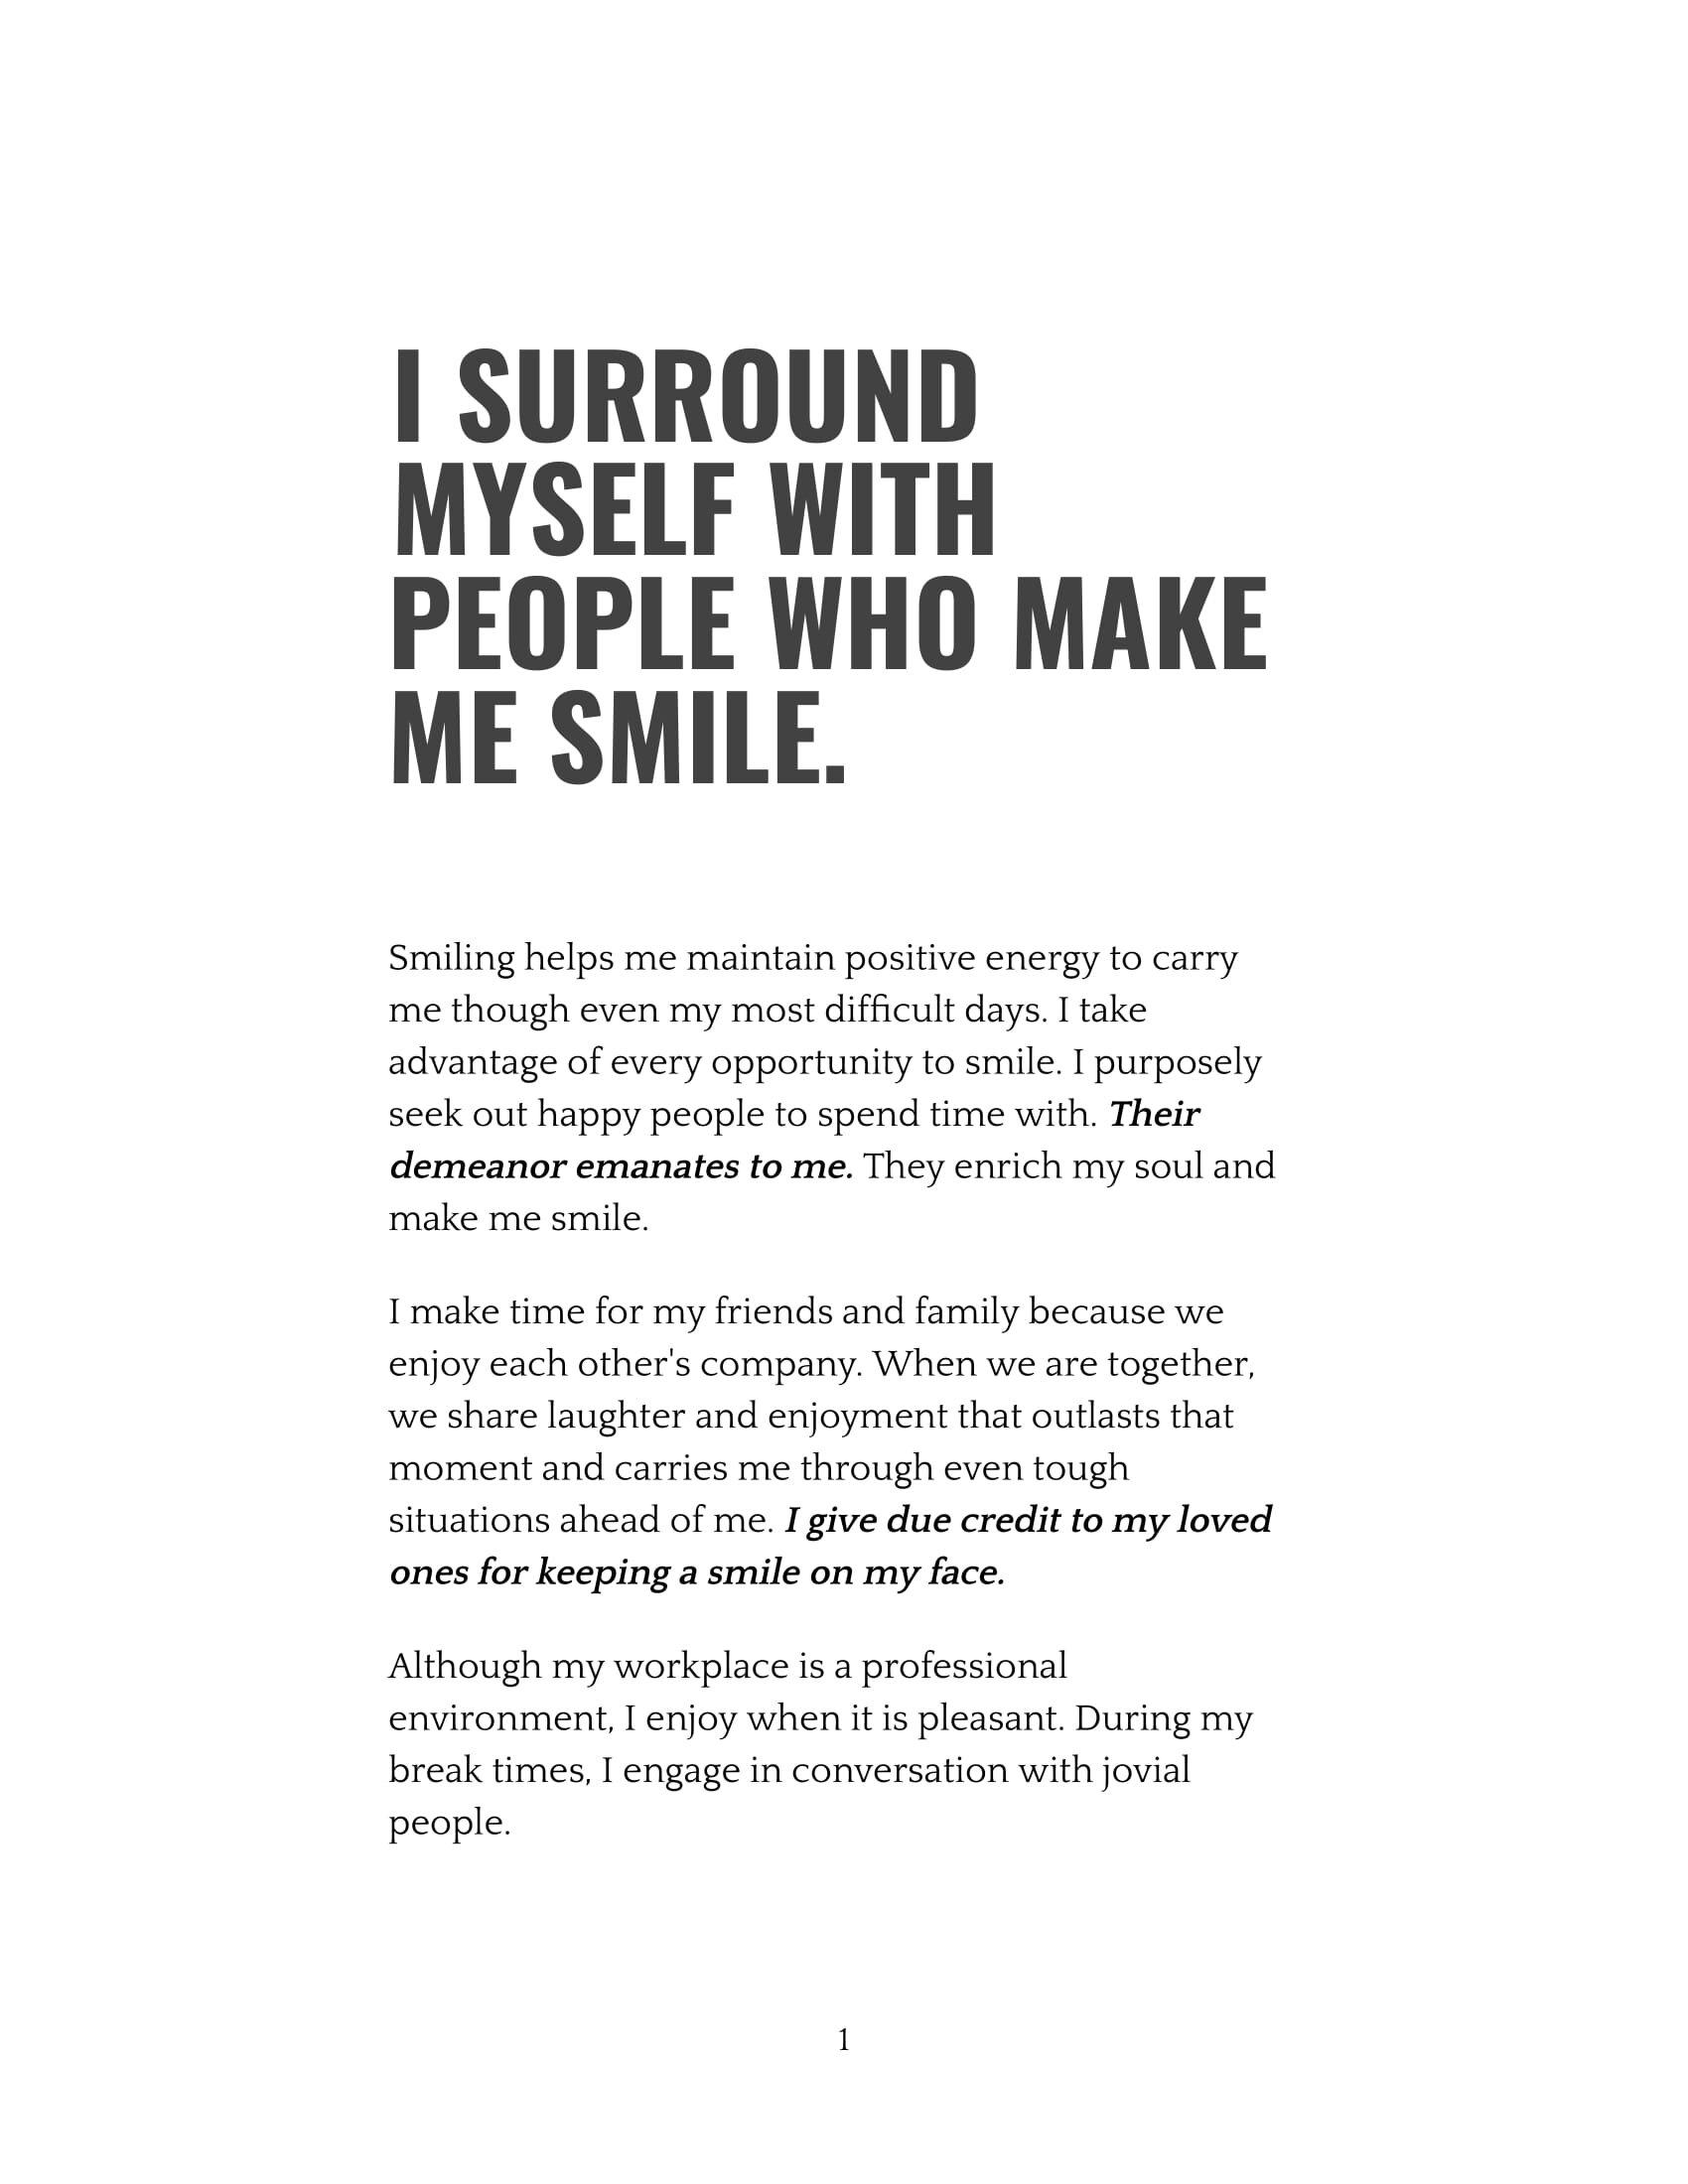 I Surround Myself With People Who Make Me Smile-1.jpg